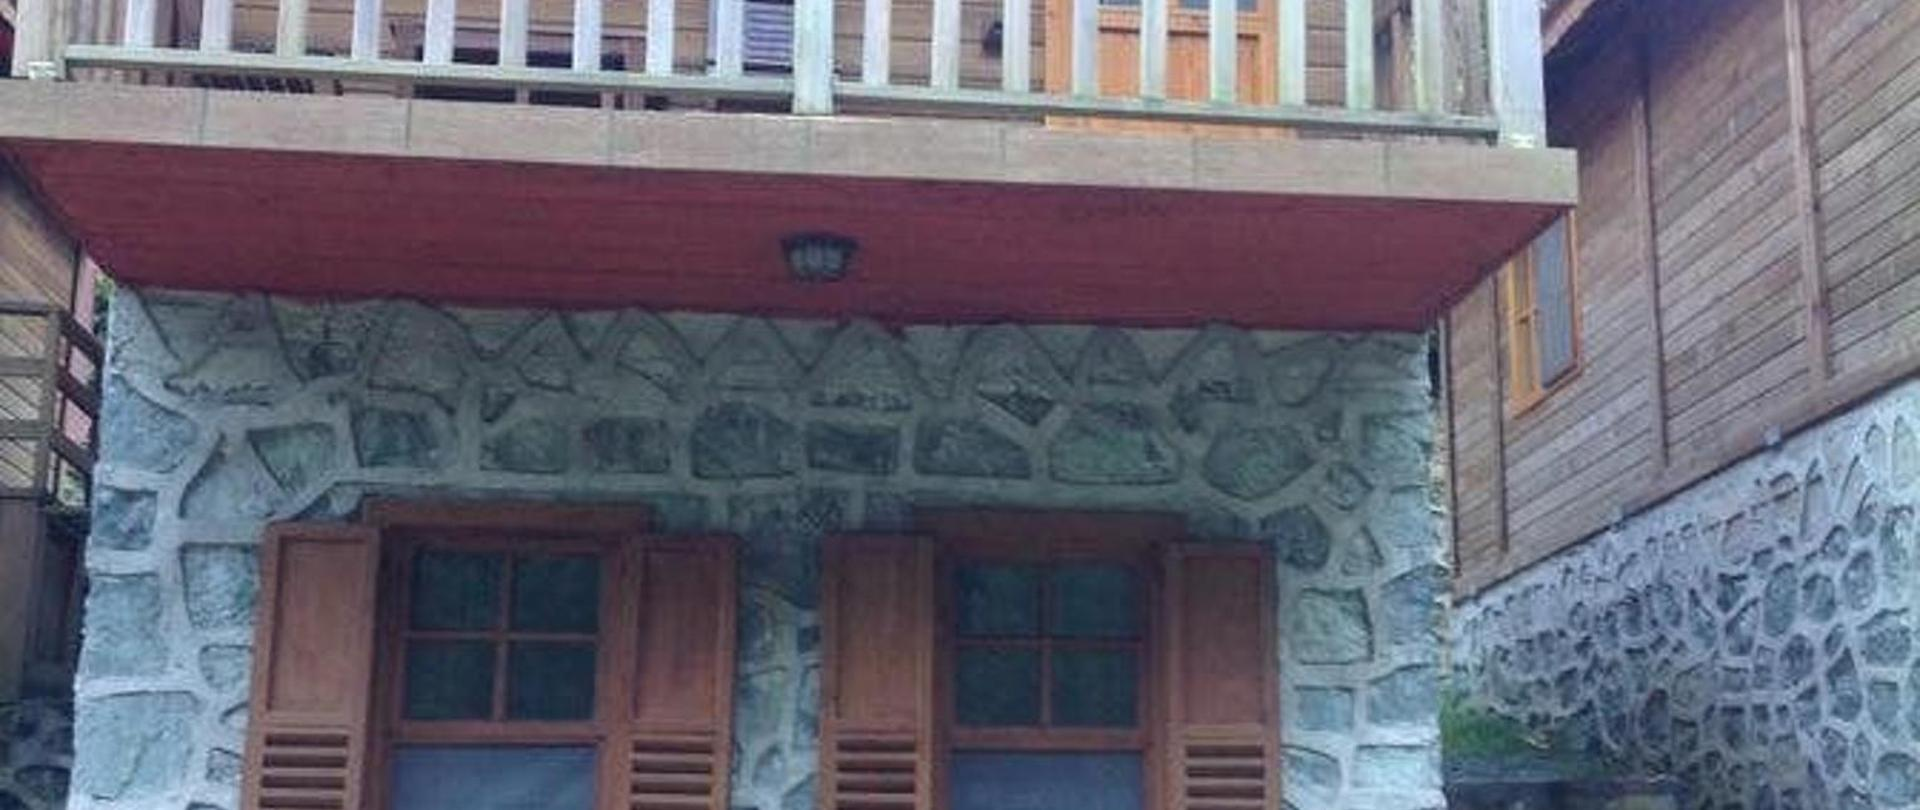 Artvin bungalow evler.jpg